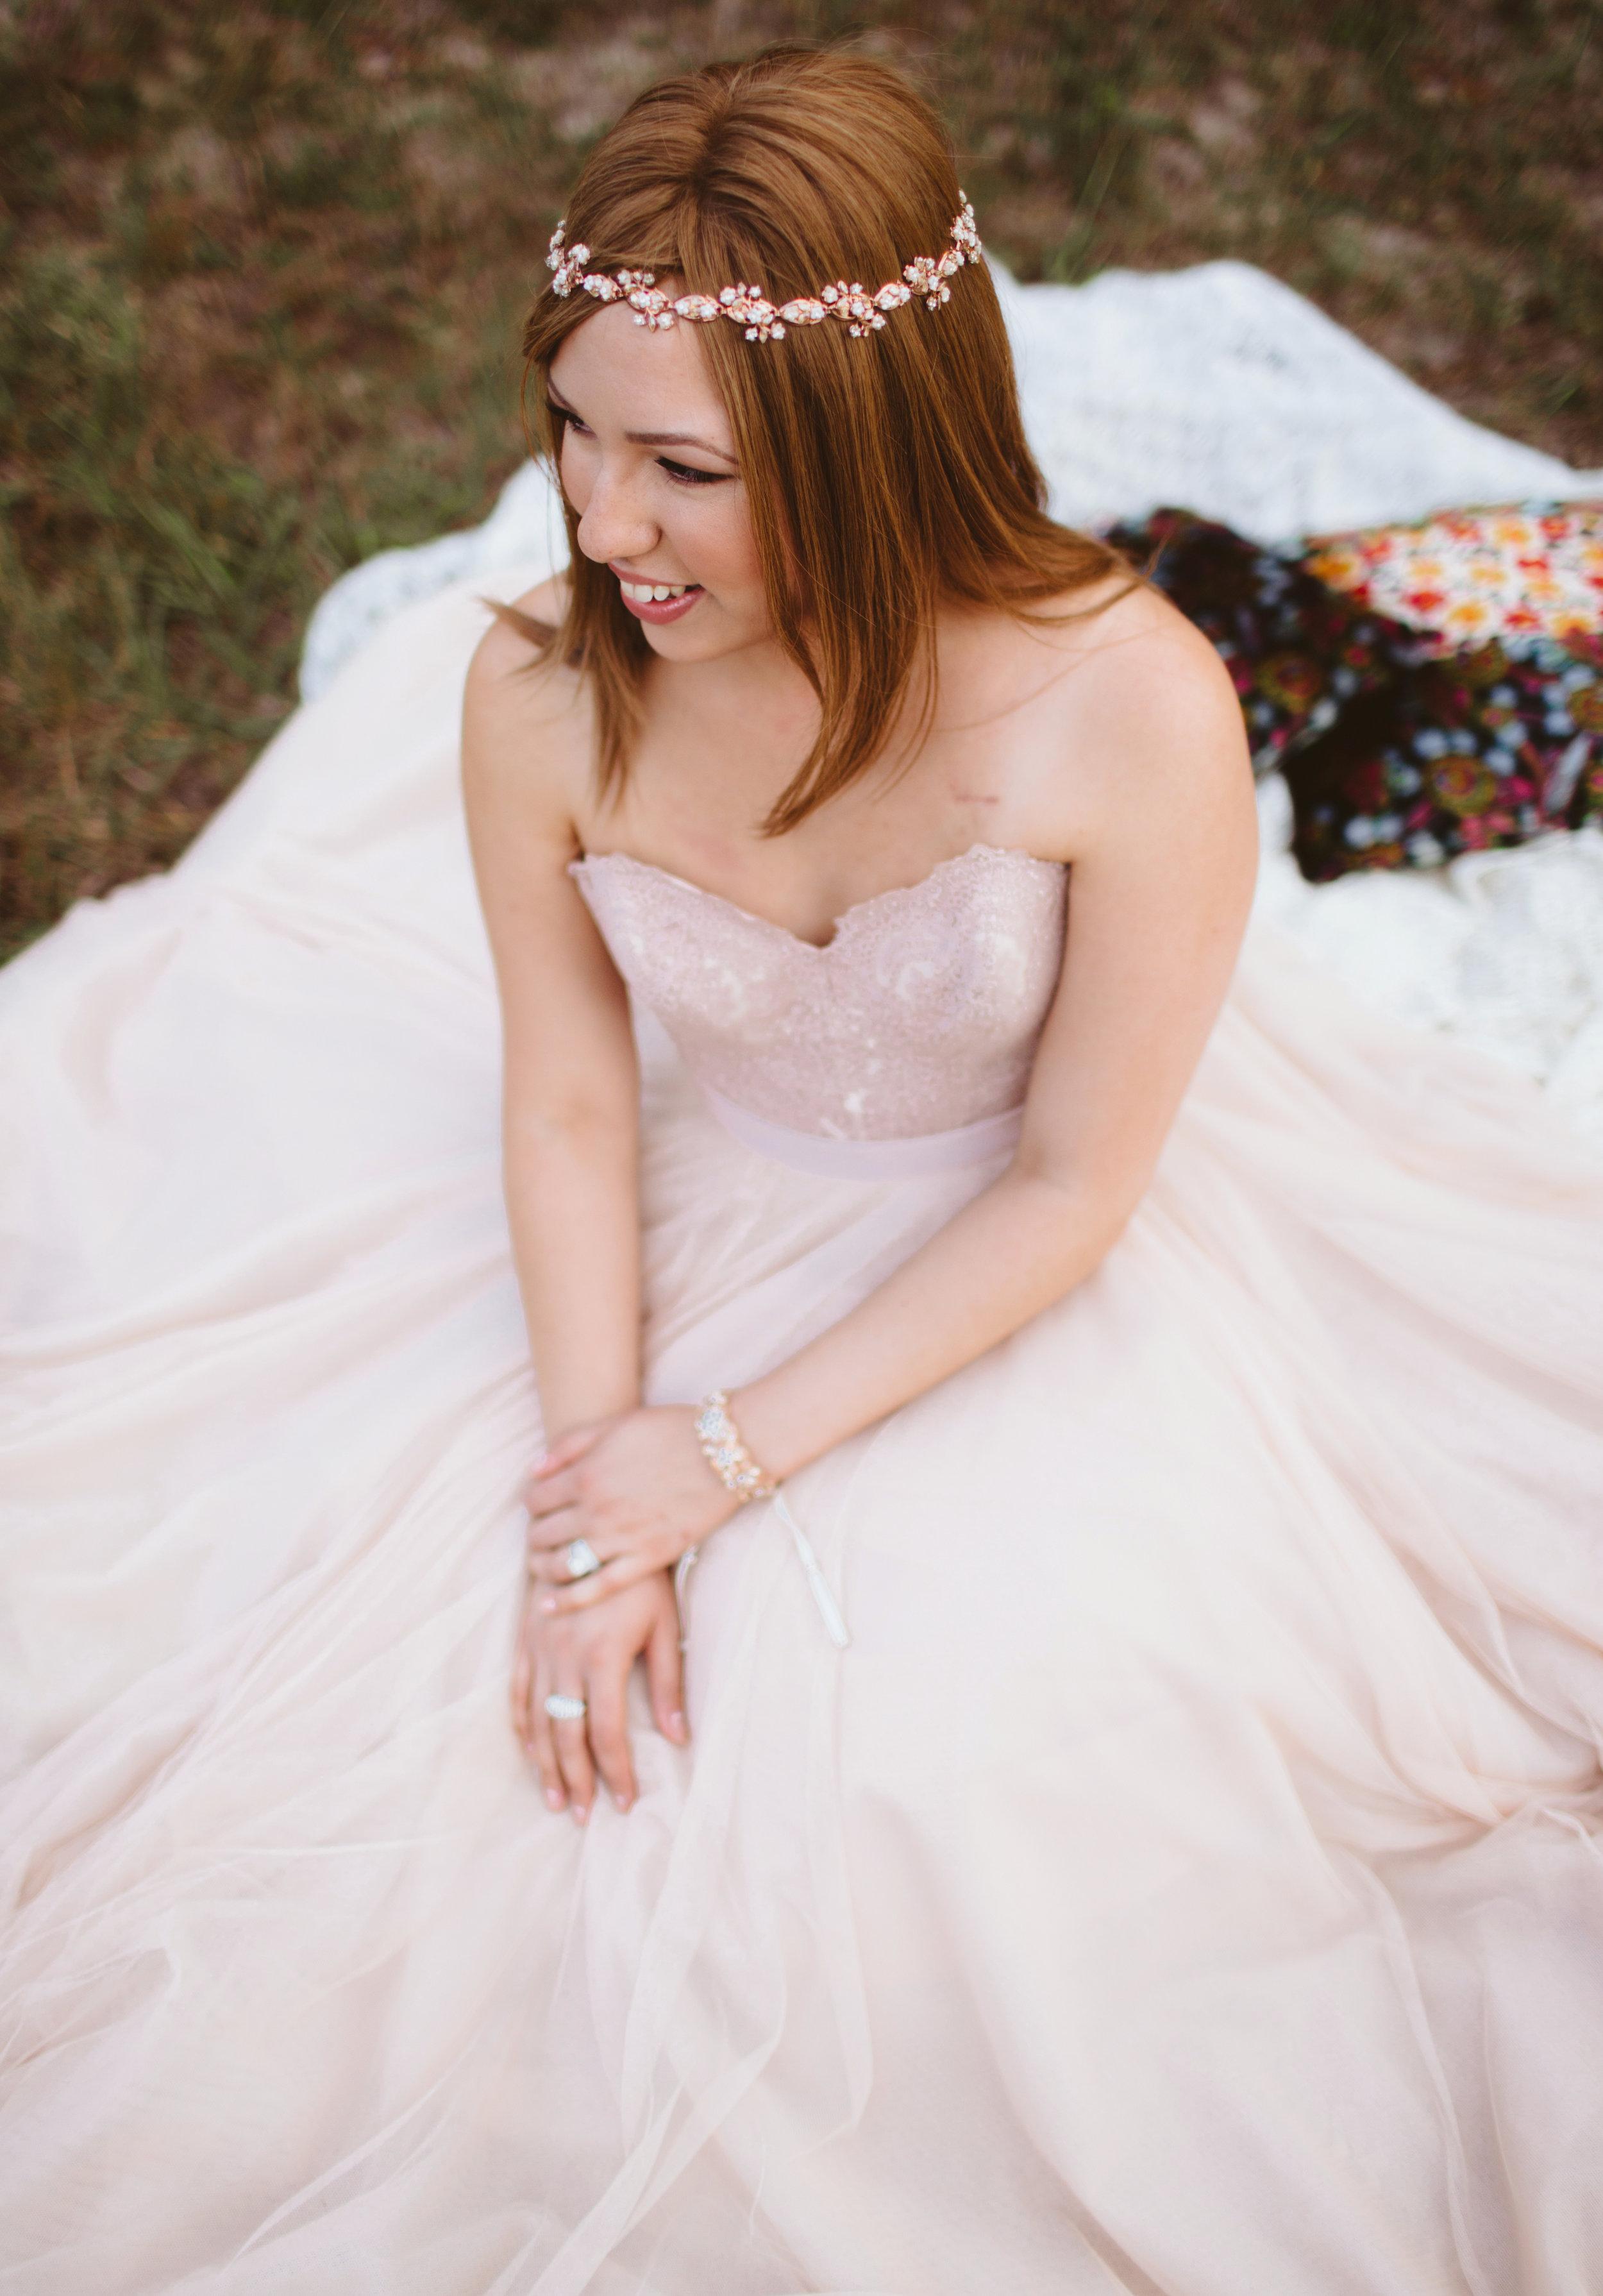 Breast Cancer awareness | Solutions bridal | Waterswoo | Vanessa Boy | vanessaboy.com |-403.com |final.jpg